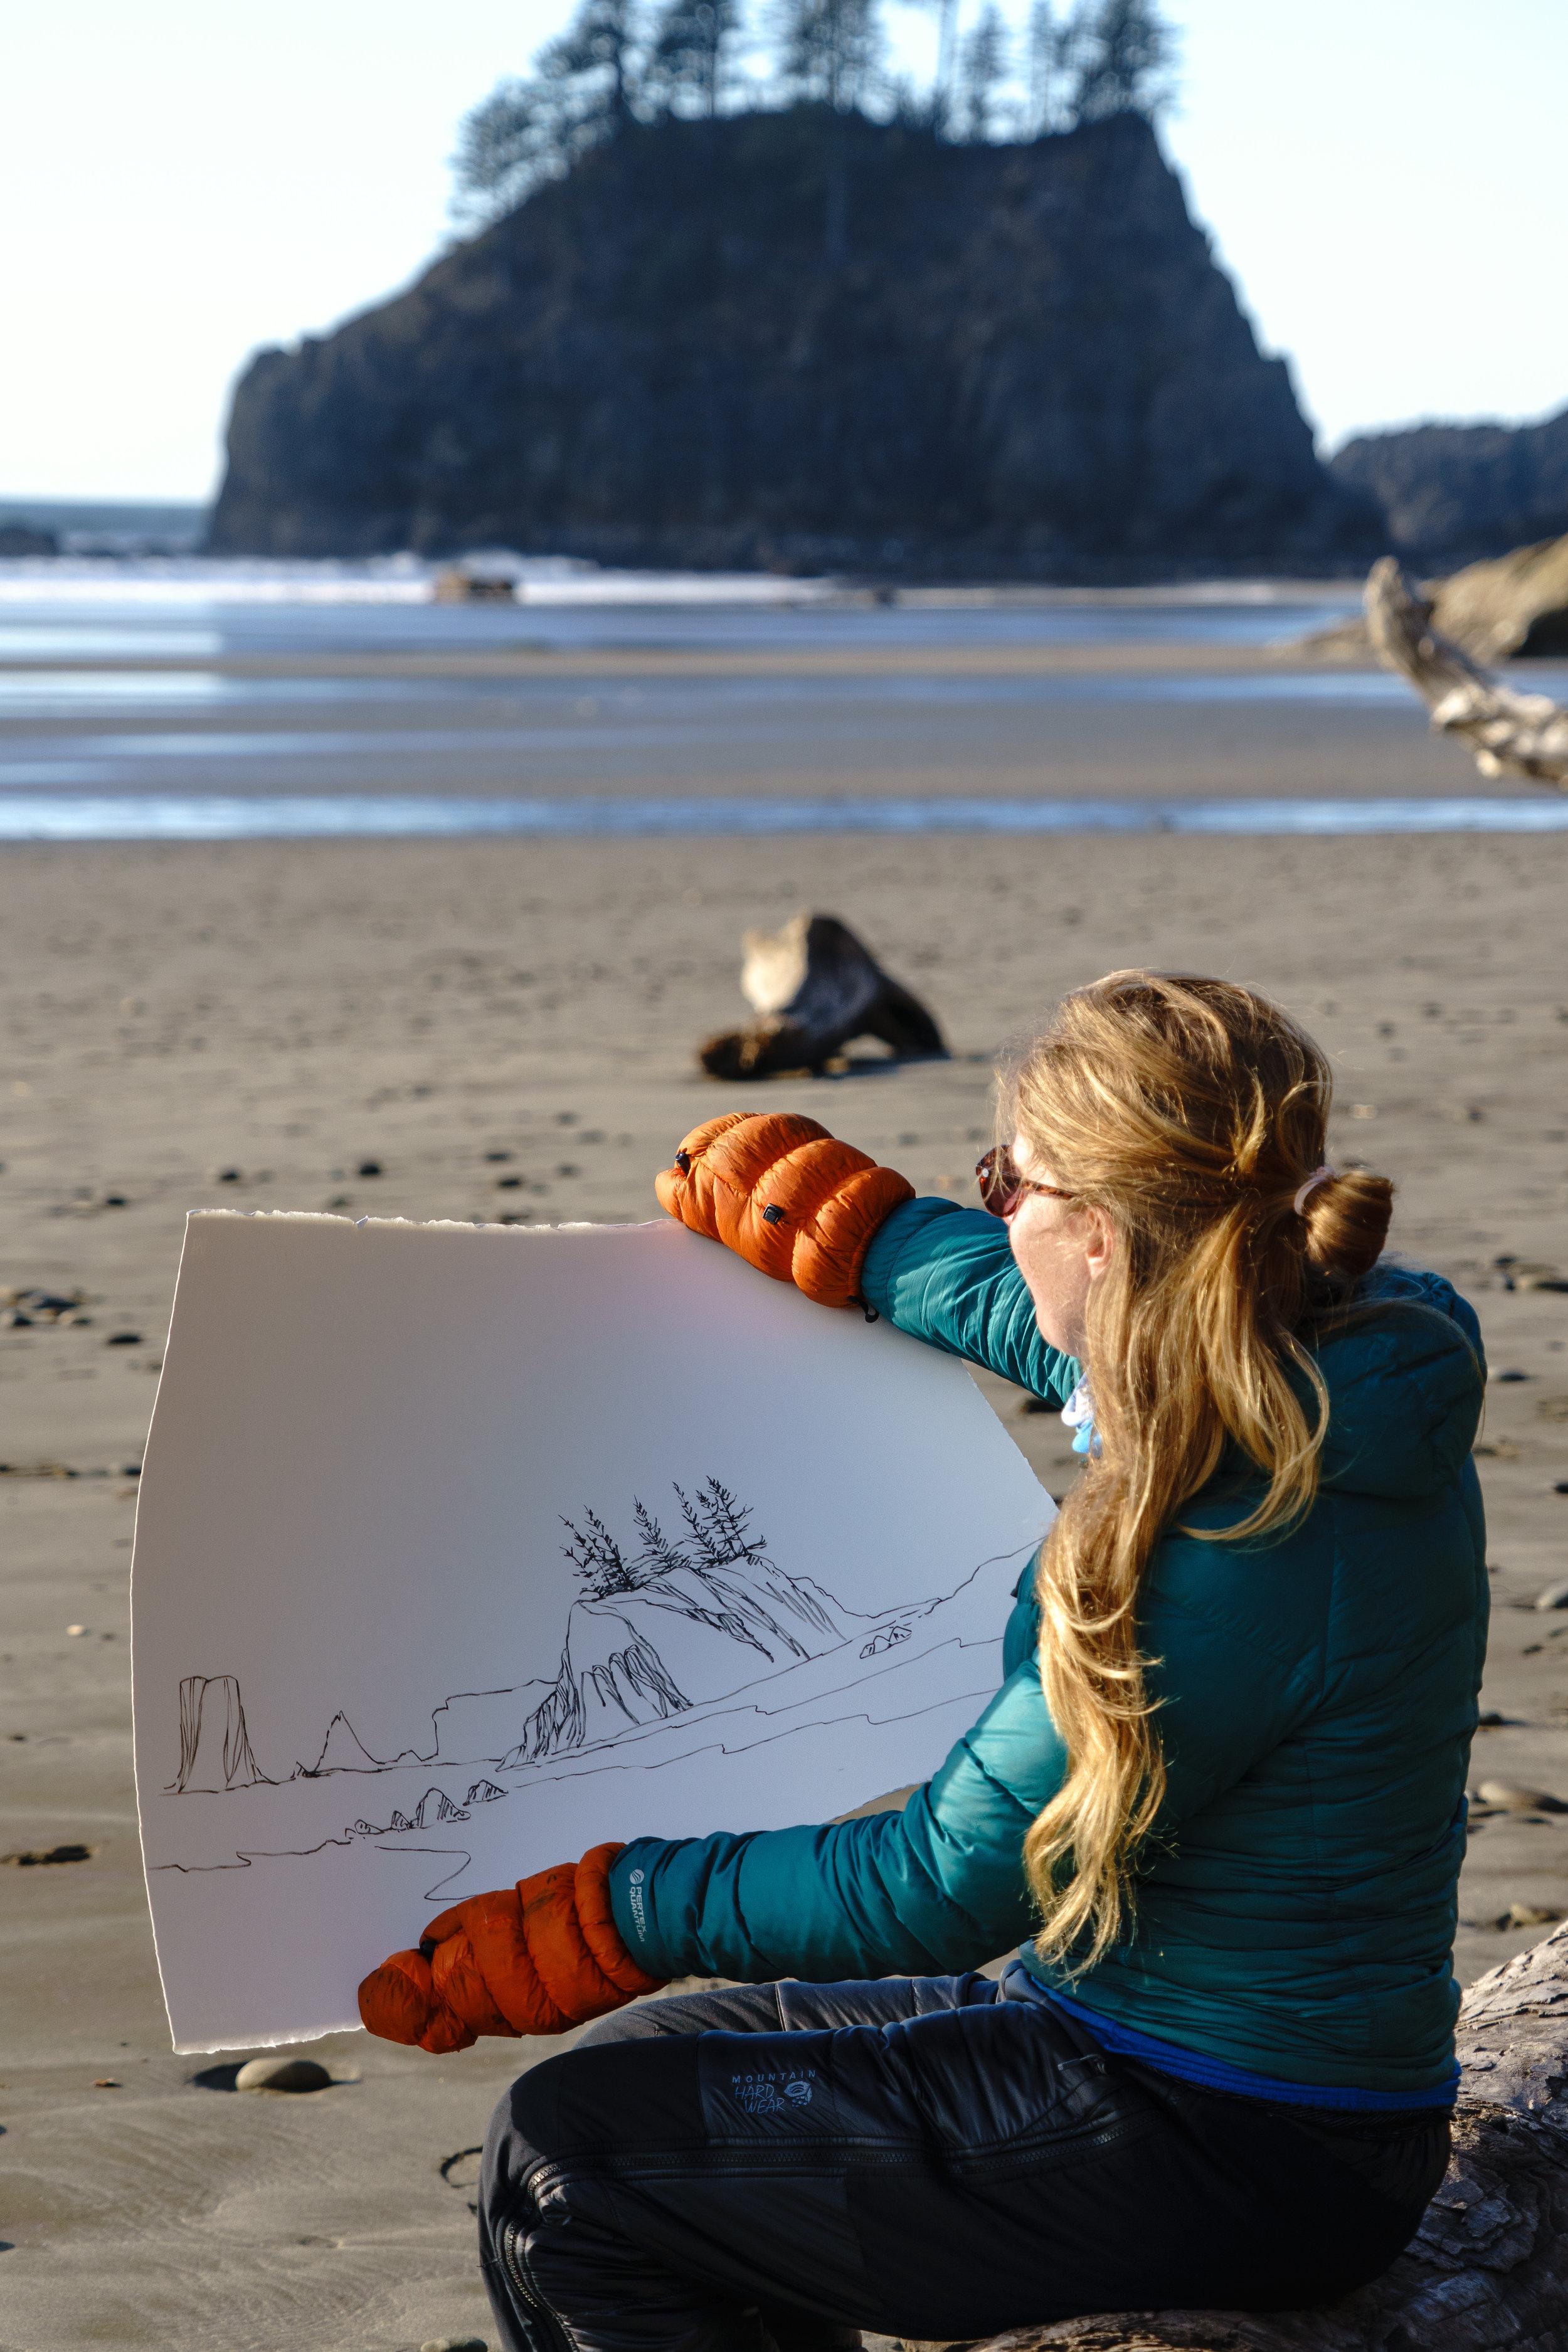 Nikki painting